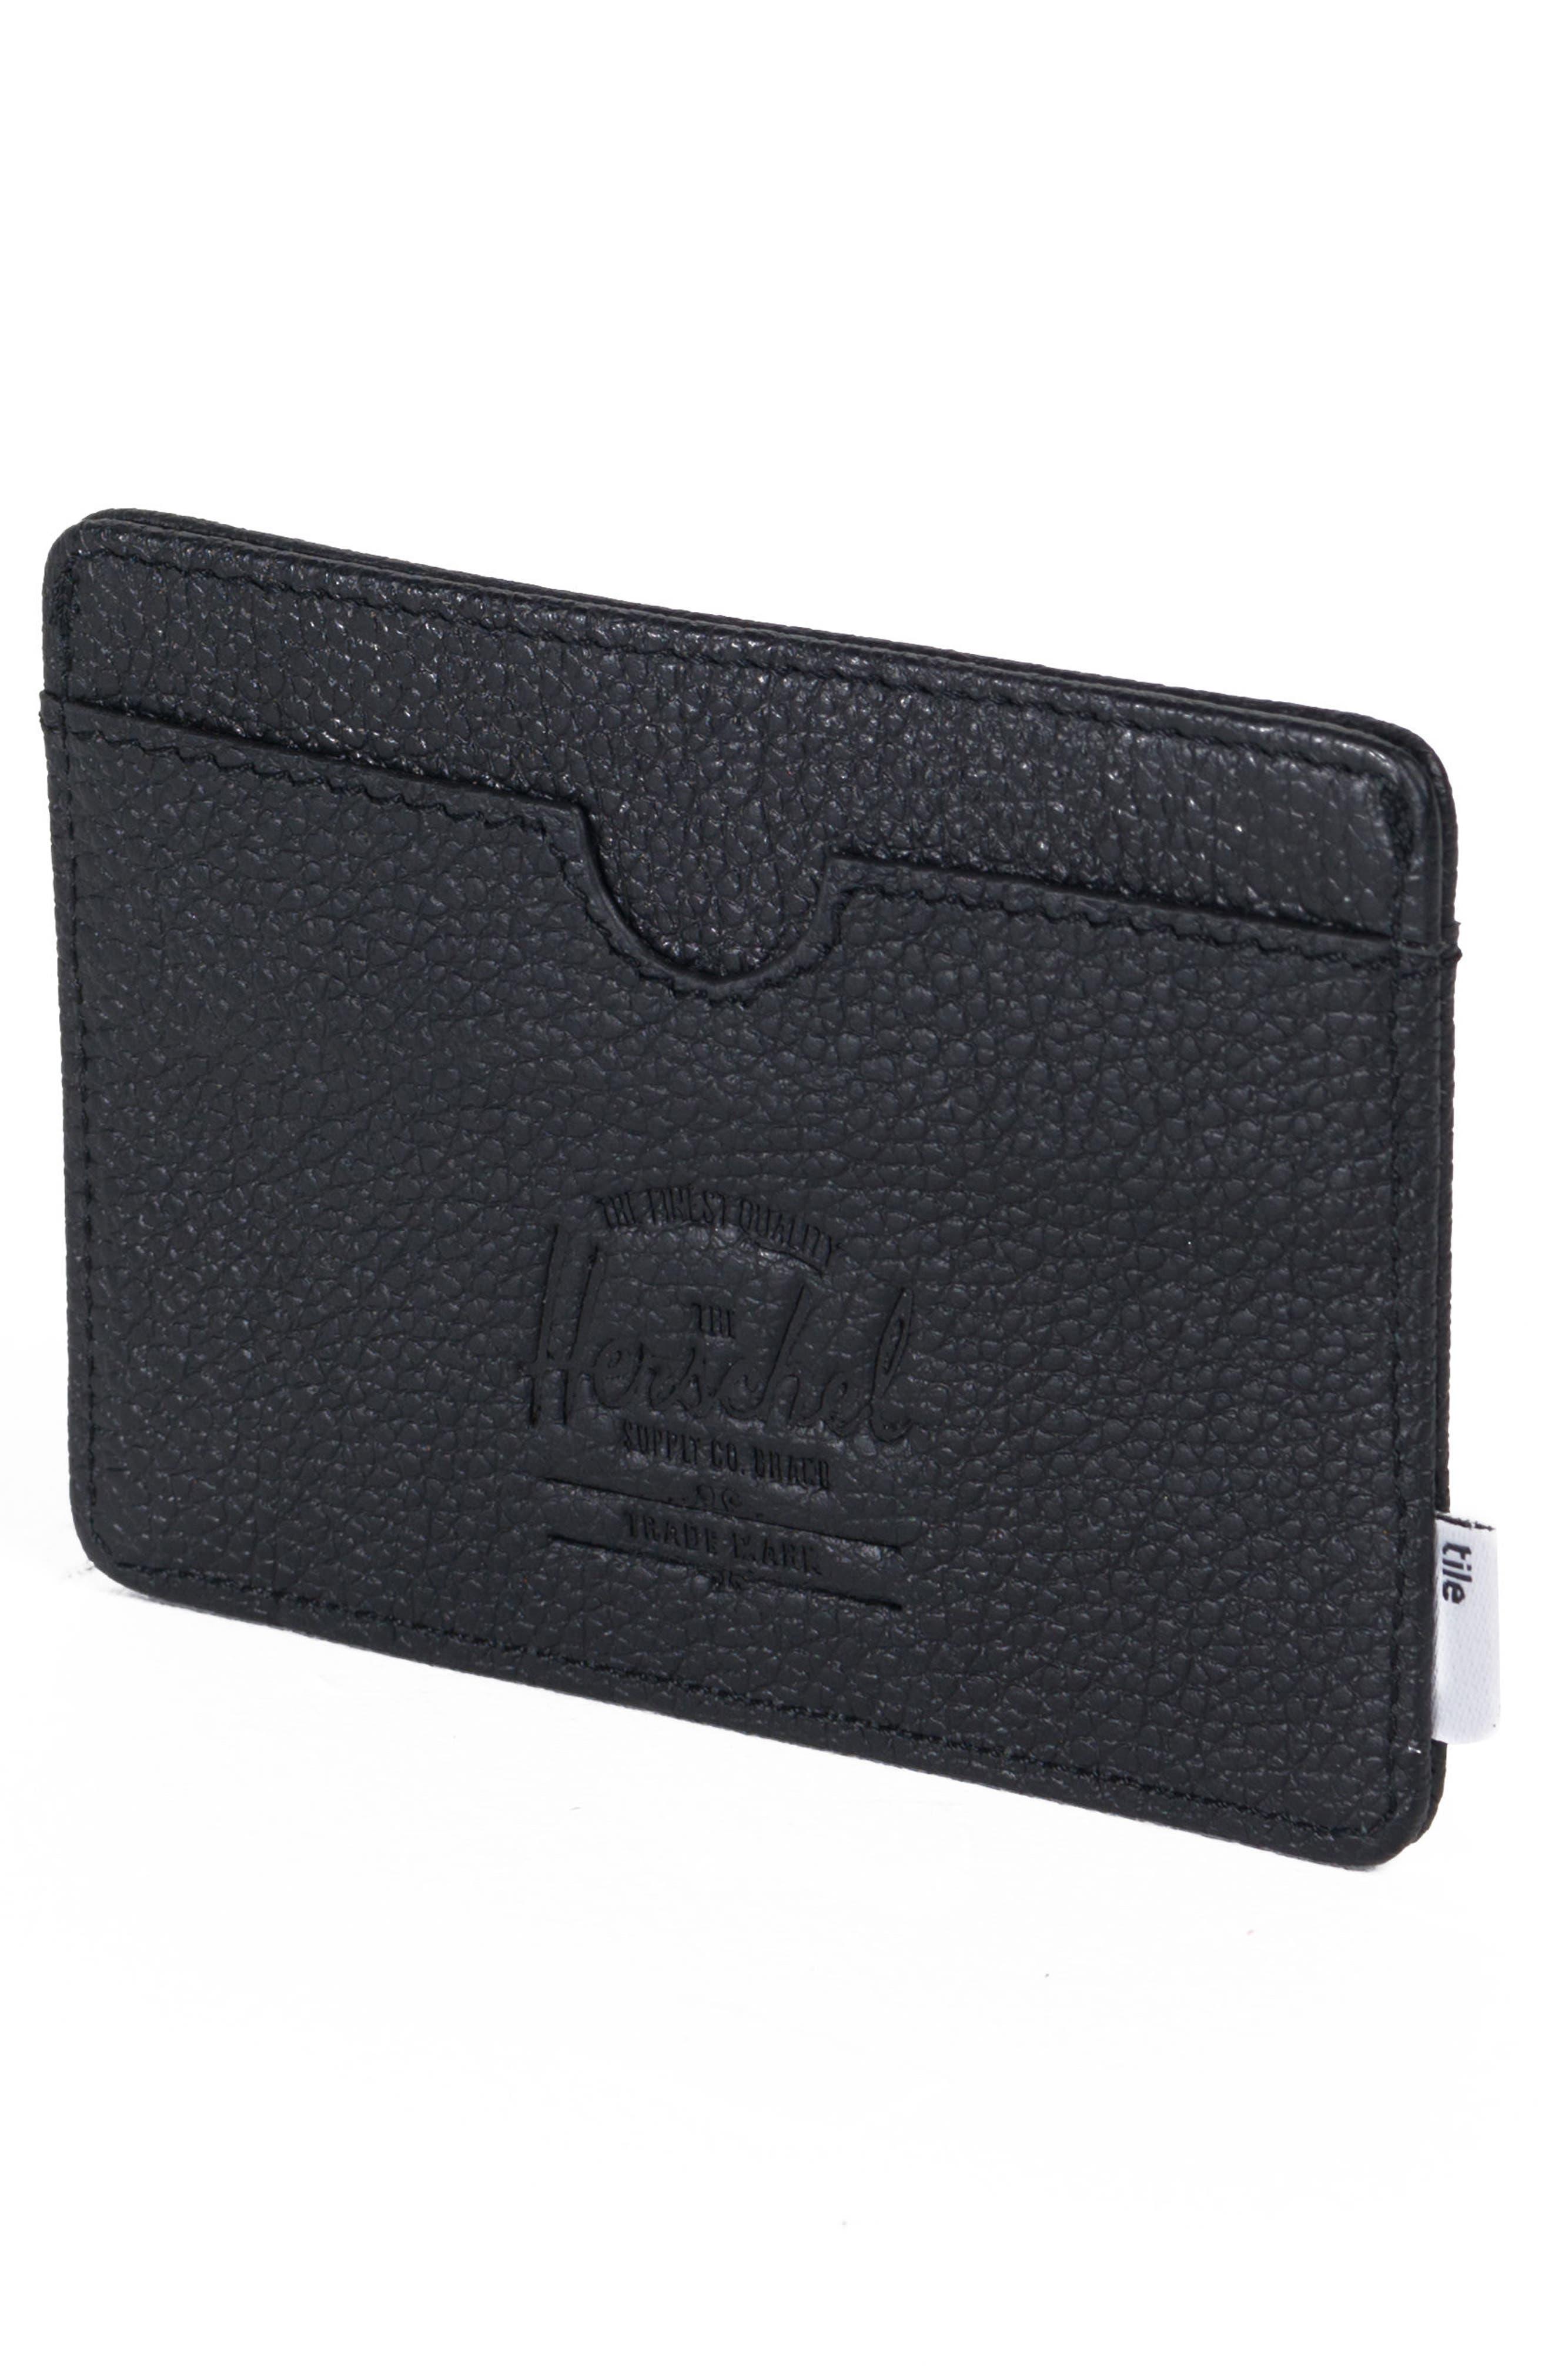 Tile Slim Charlie Leather Card Case,                             Alternate thumbnail 2, color,                             BLACK PEBBLED LEATHER